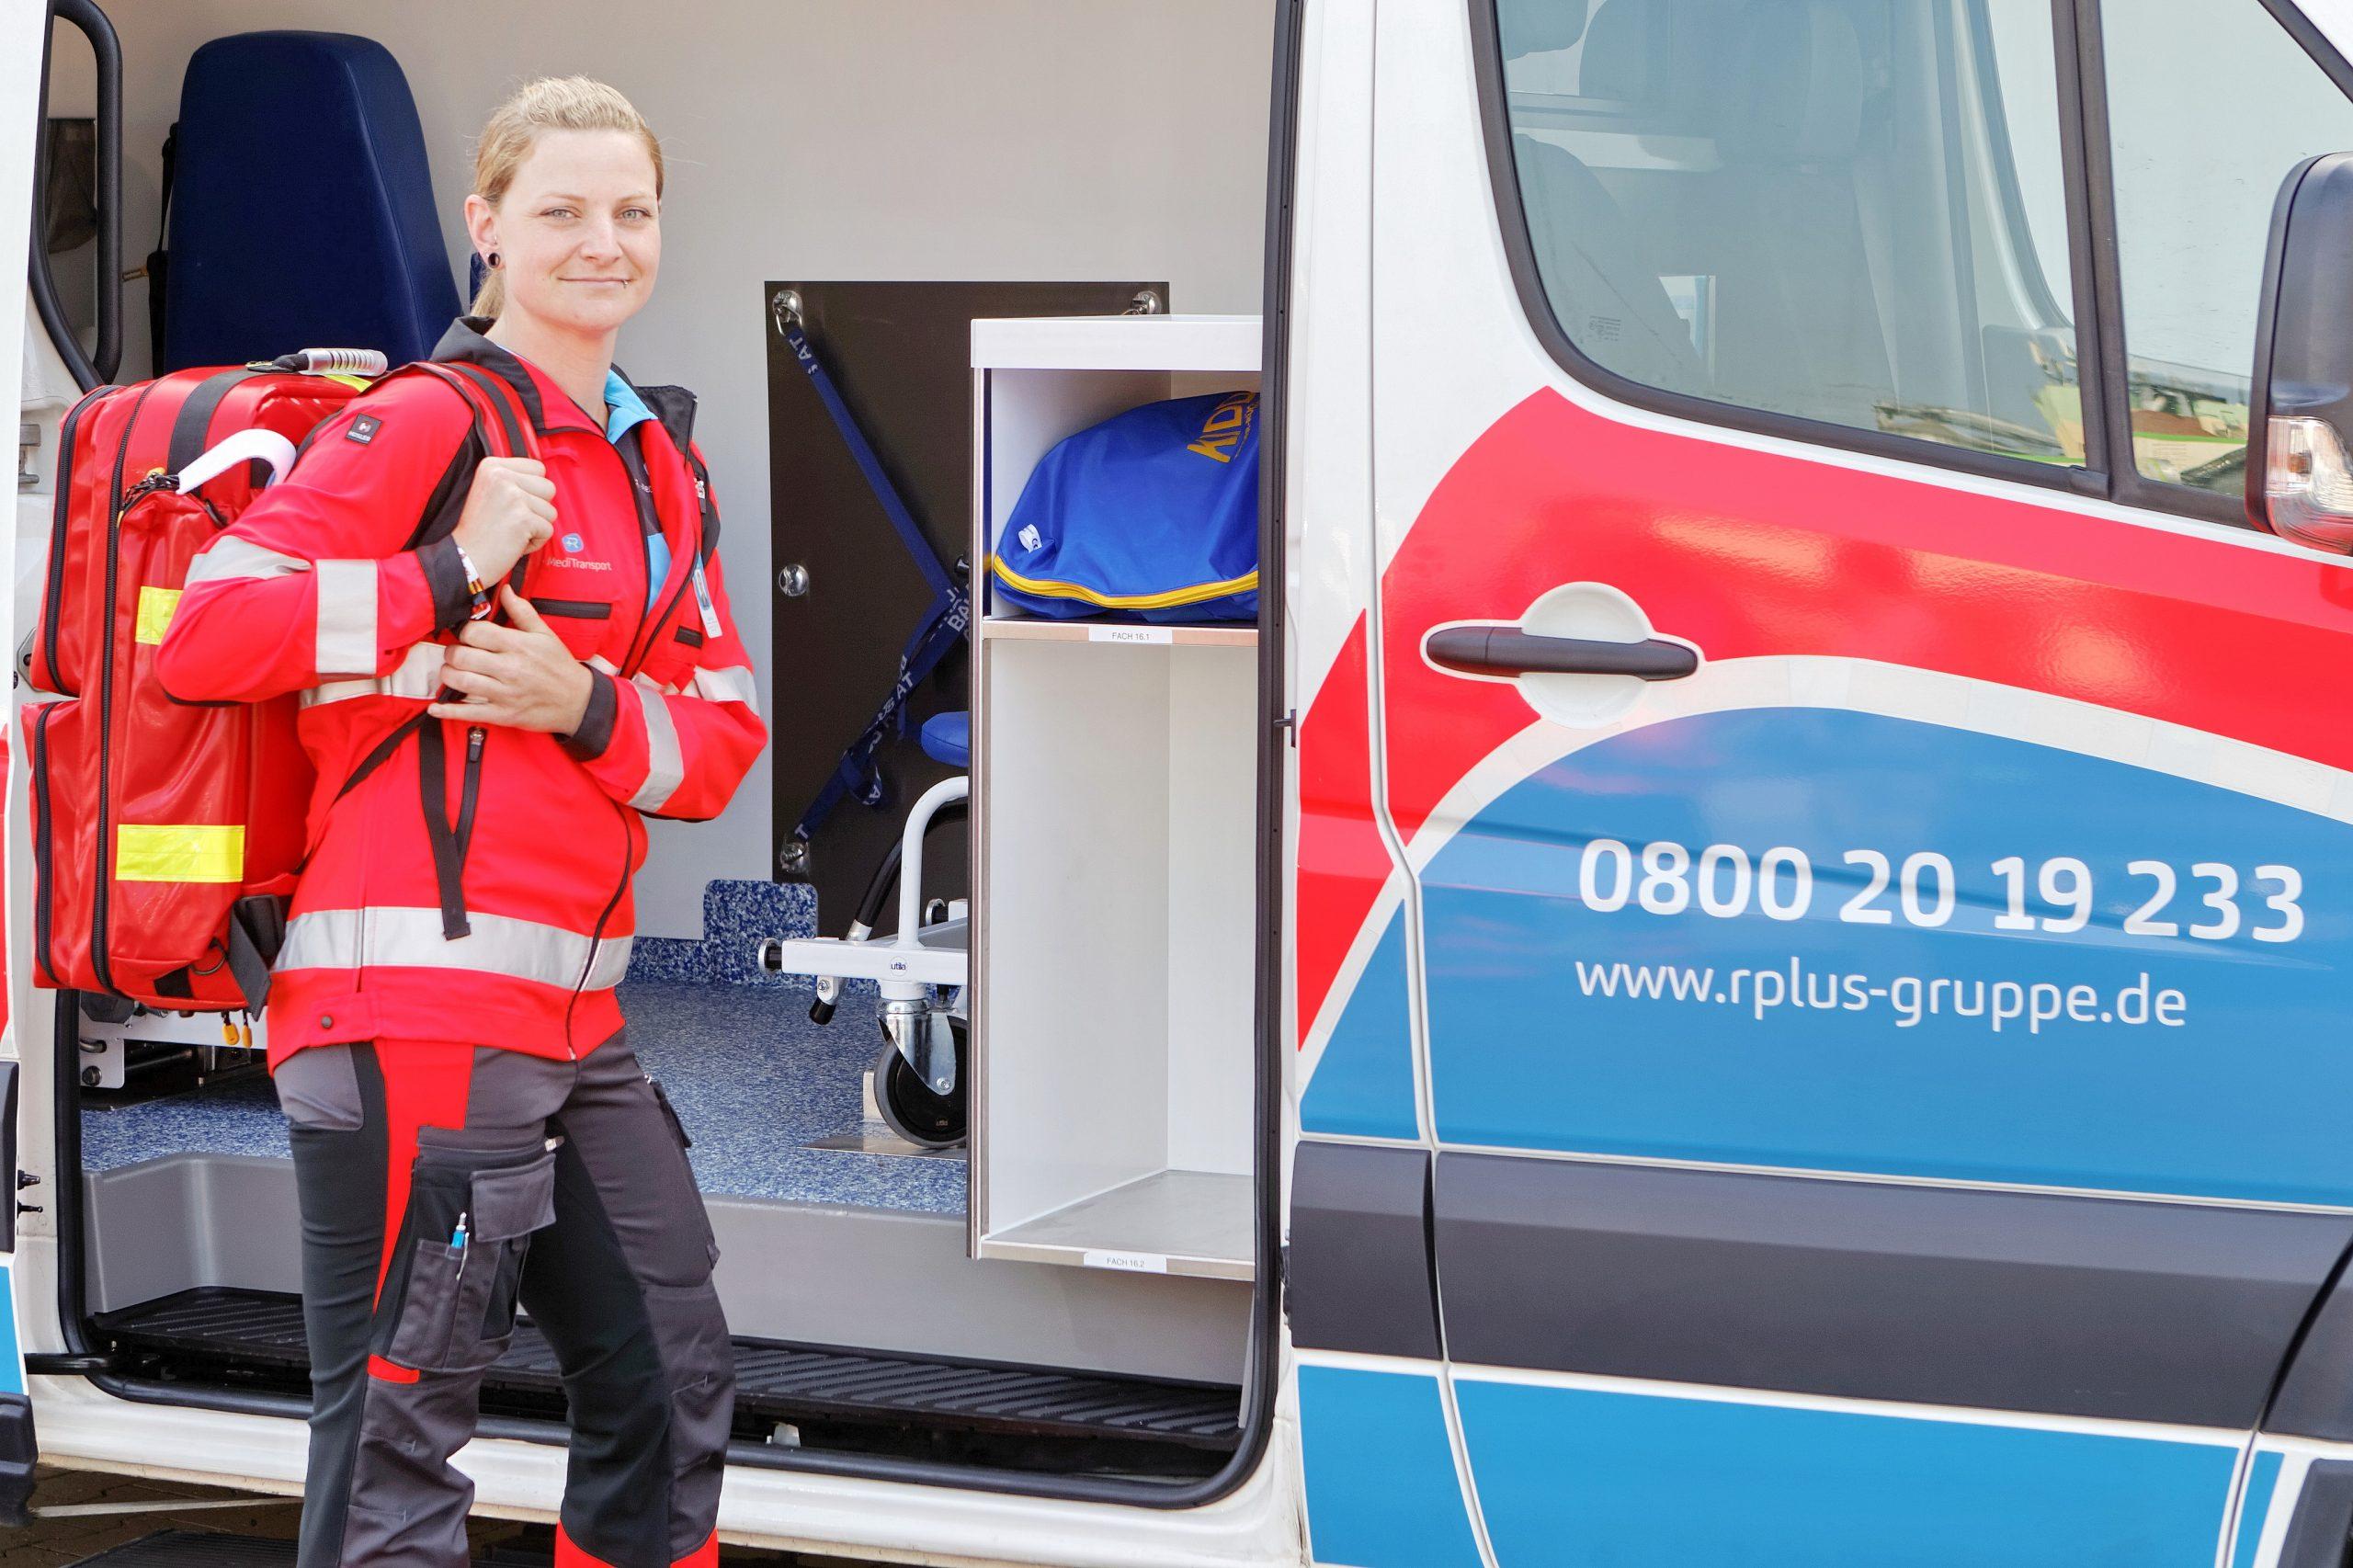 rplus-meditransport-krankentransport-fahrdienst-kv-kvn-kassenärztliche-vereinigung-goettingen